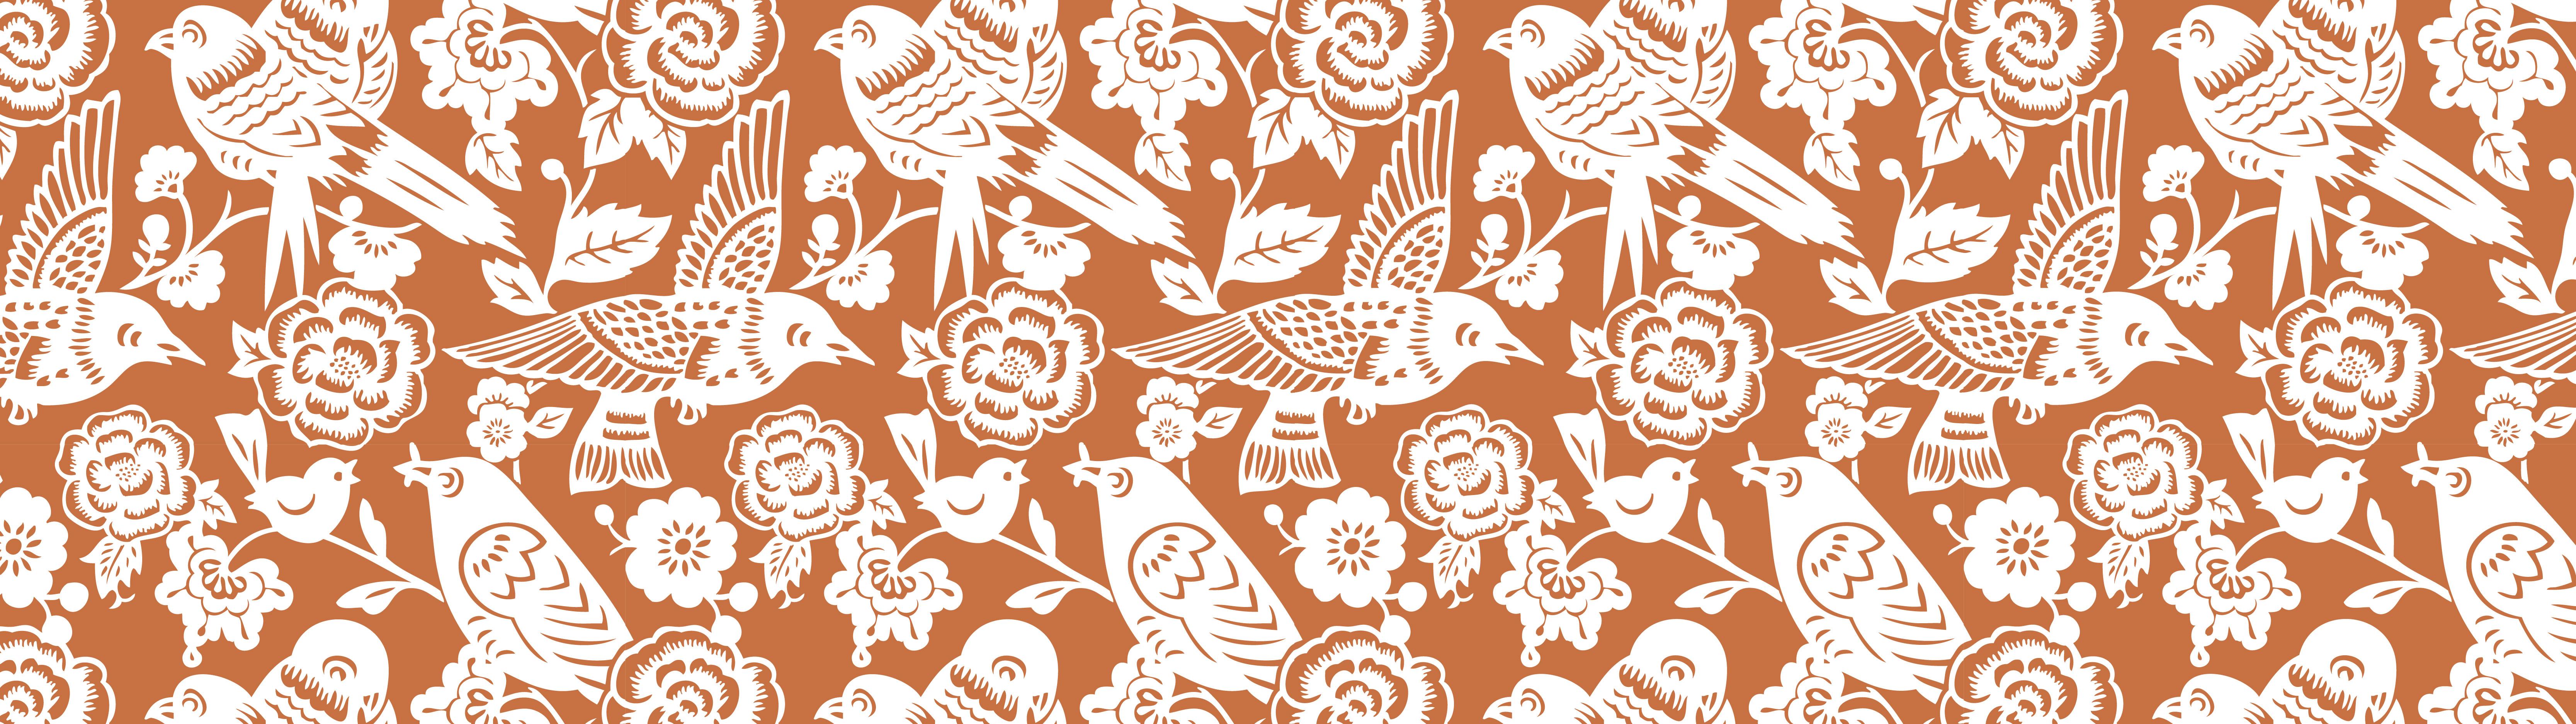 aviary-banner-orange-01.jpg